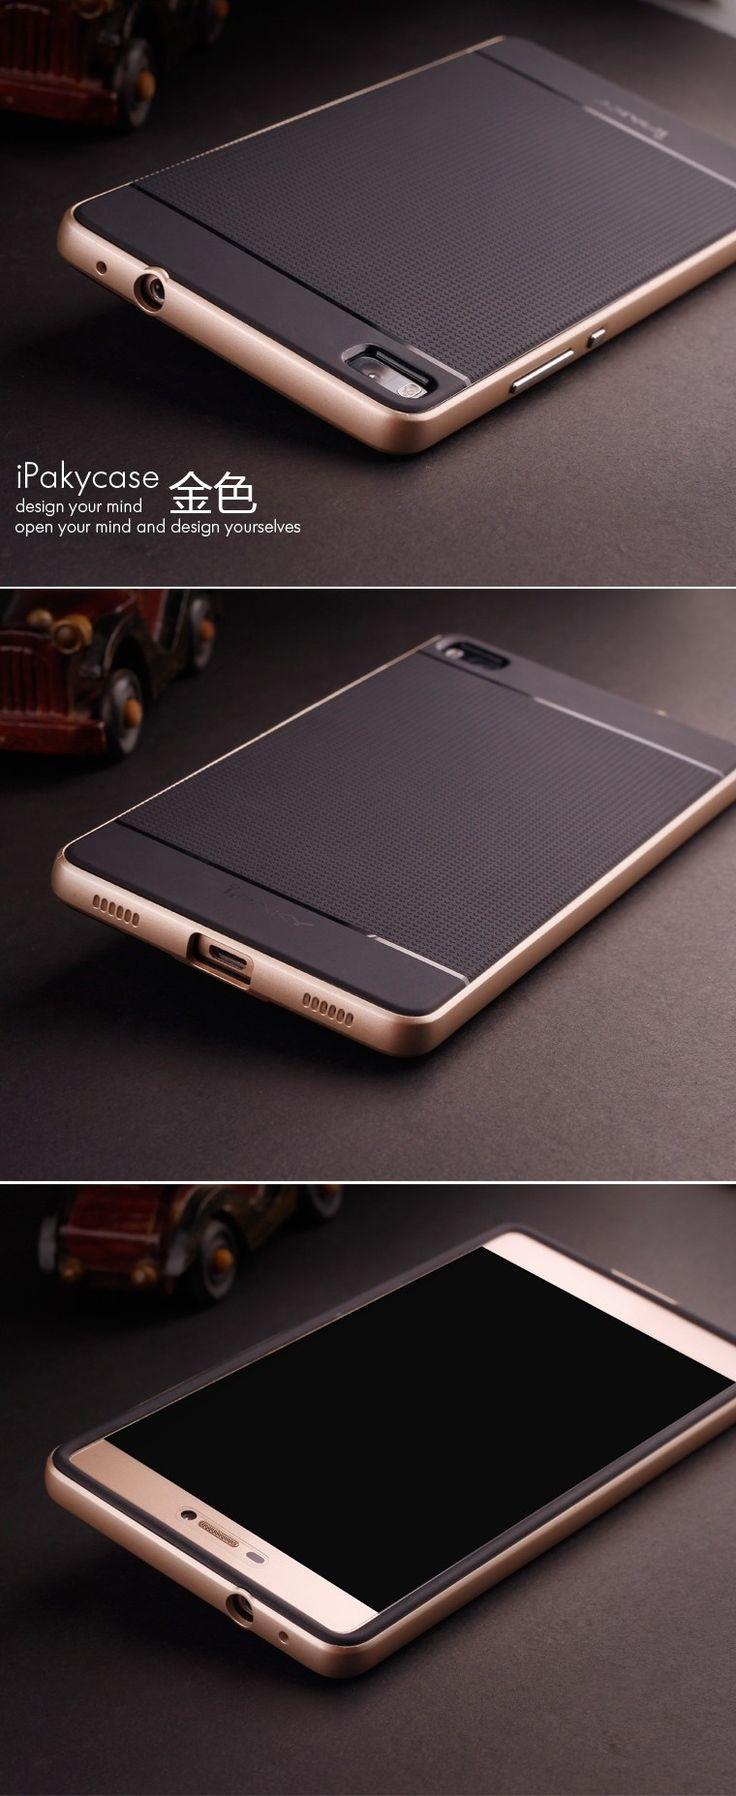 Huawei P8 iPakycase Ultra Fin Hybrid PC Bumper + Silicone Back Case